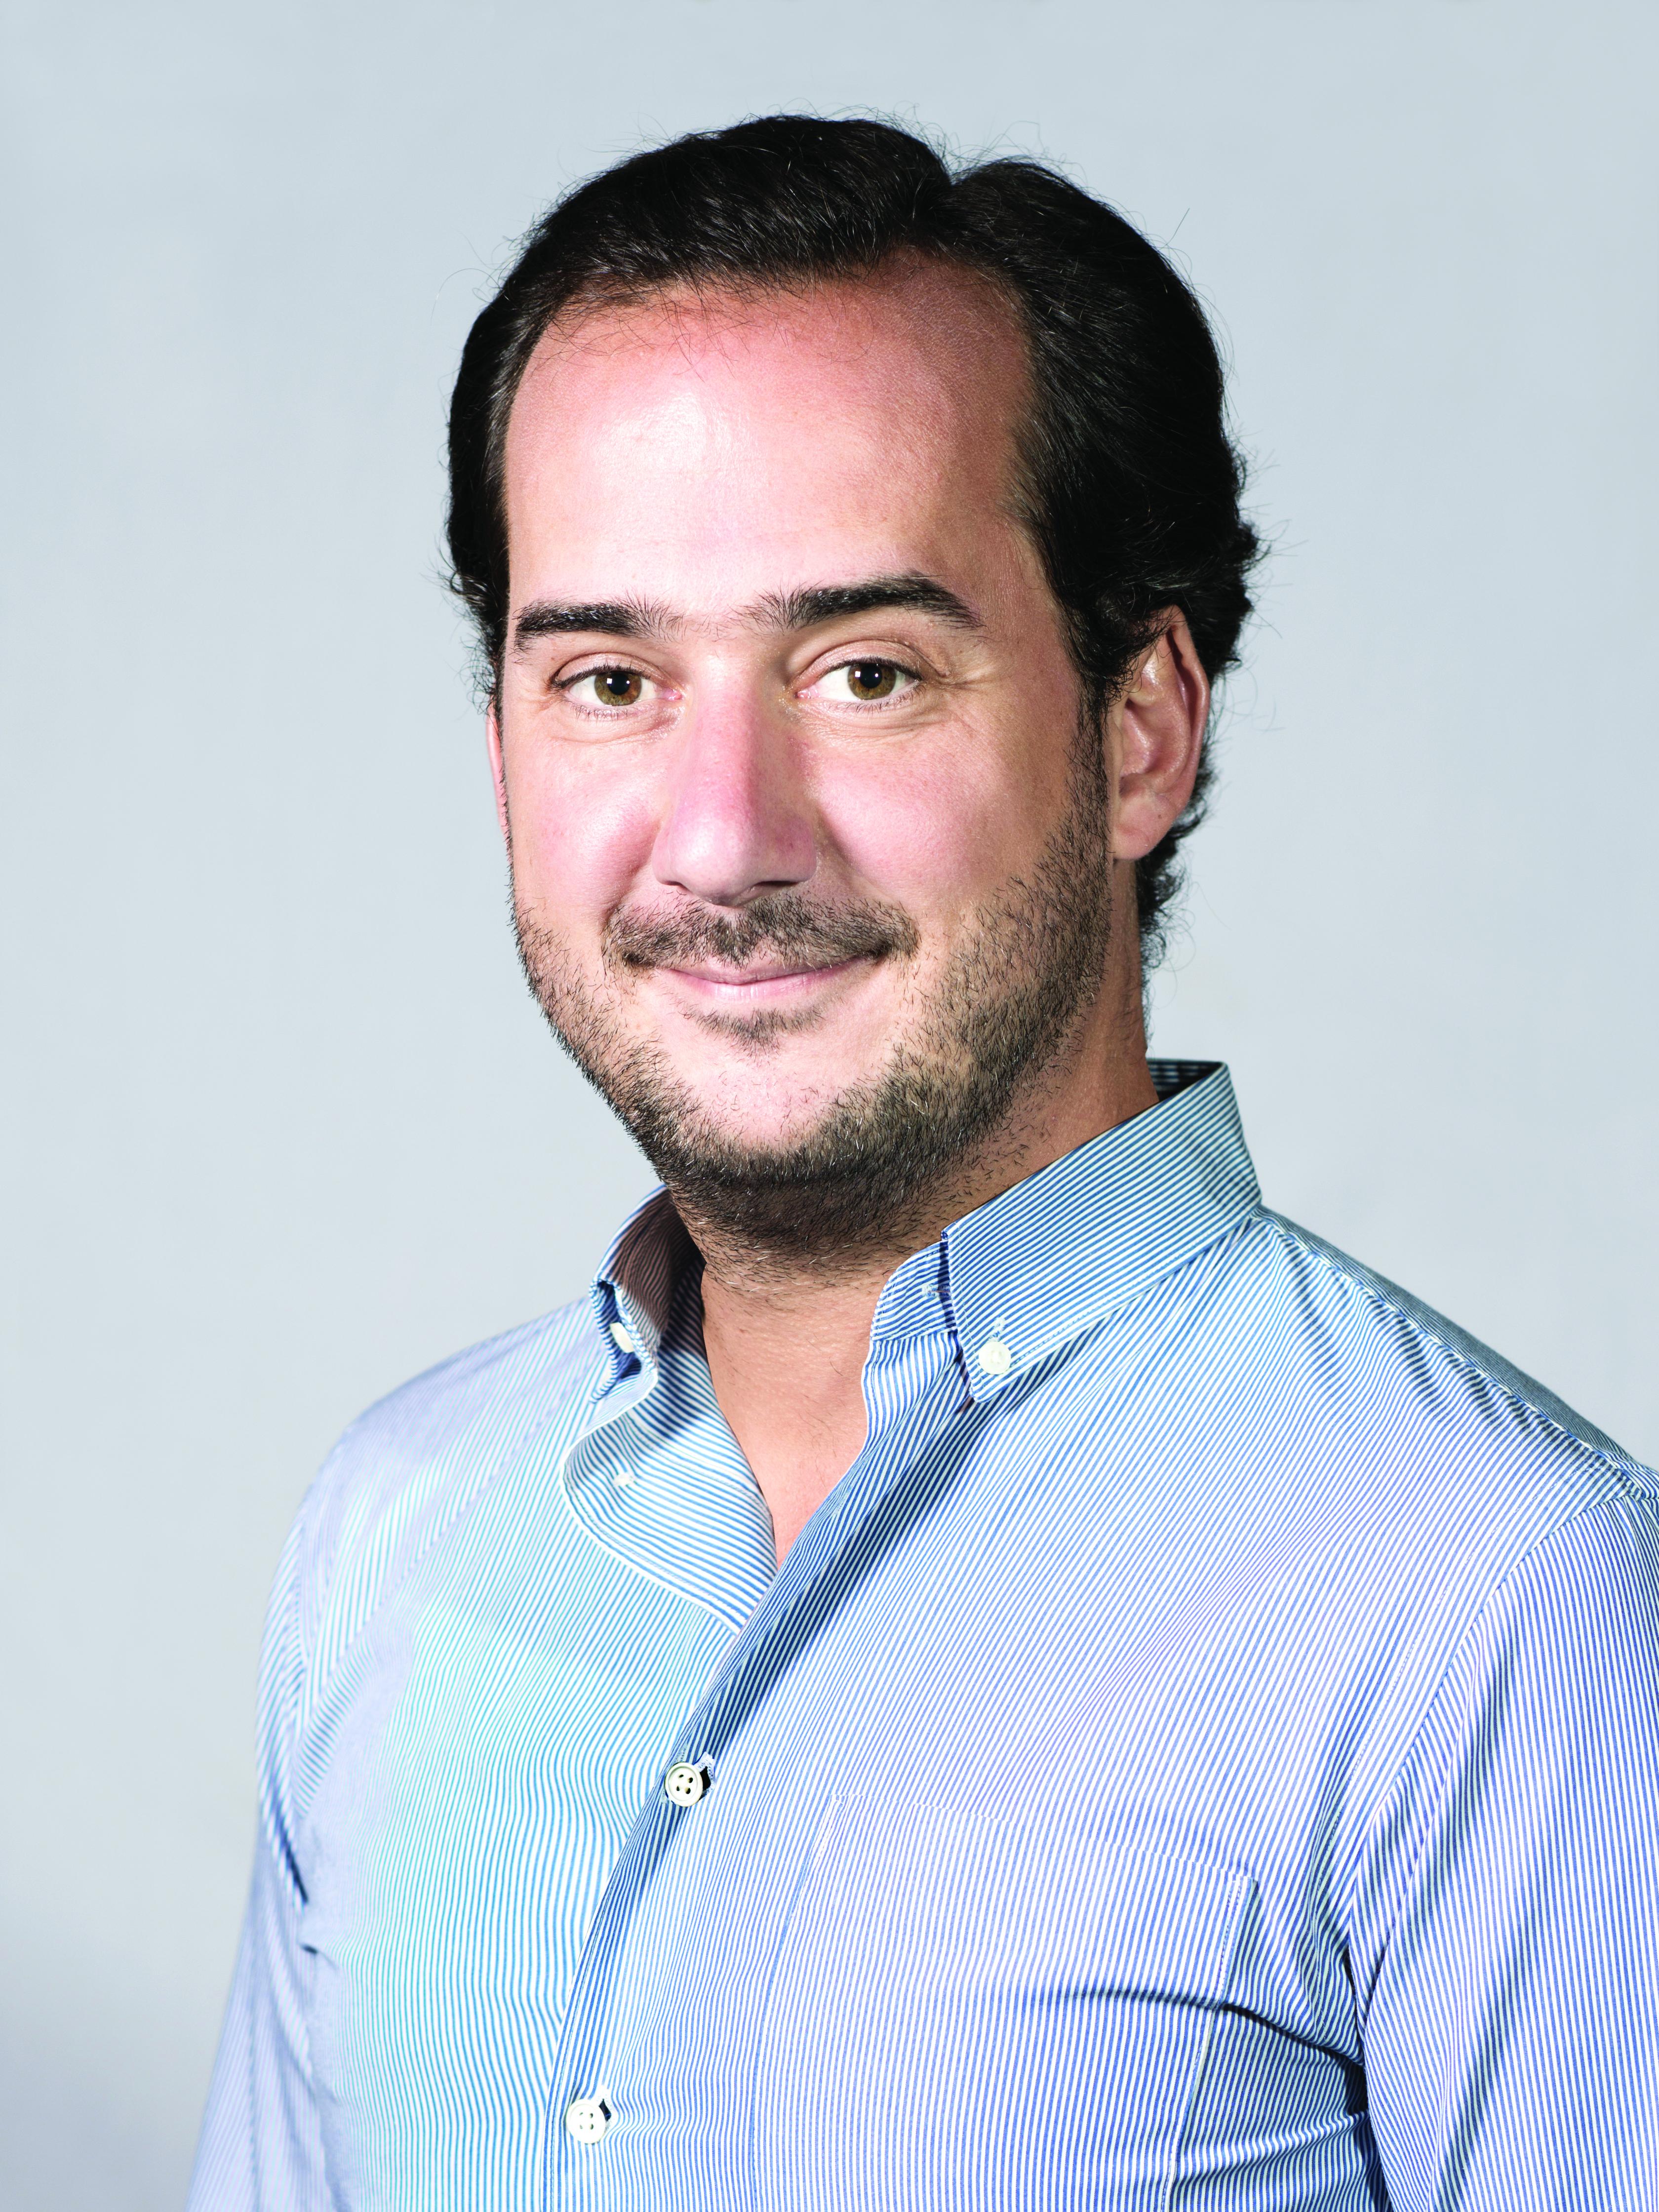 Bertrand Quesada, Teads CEO